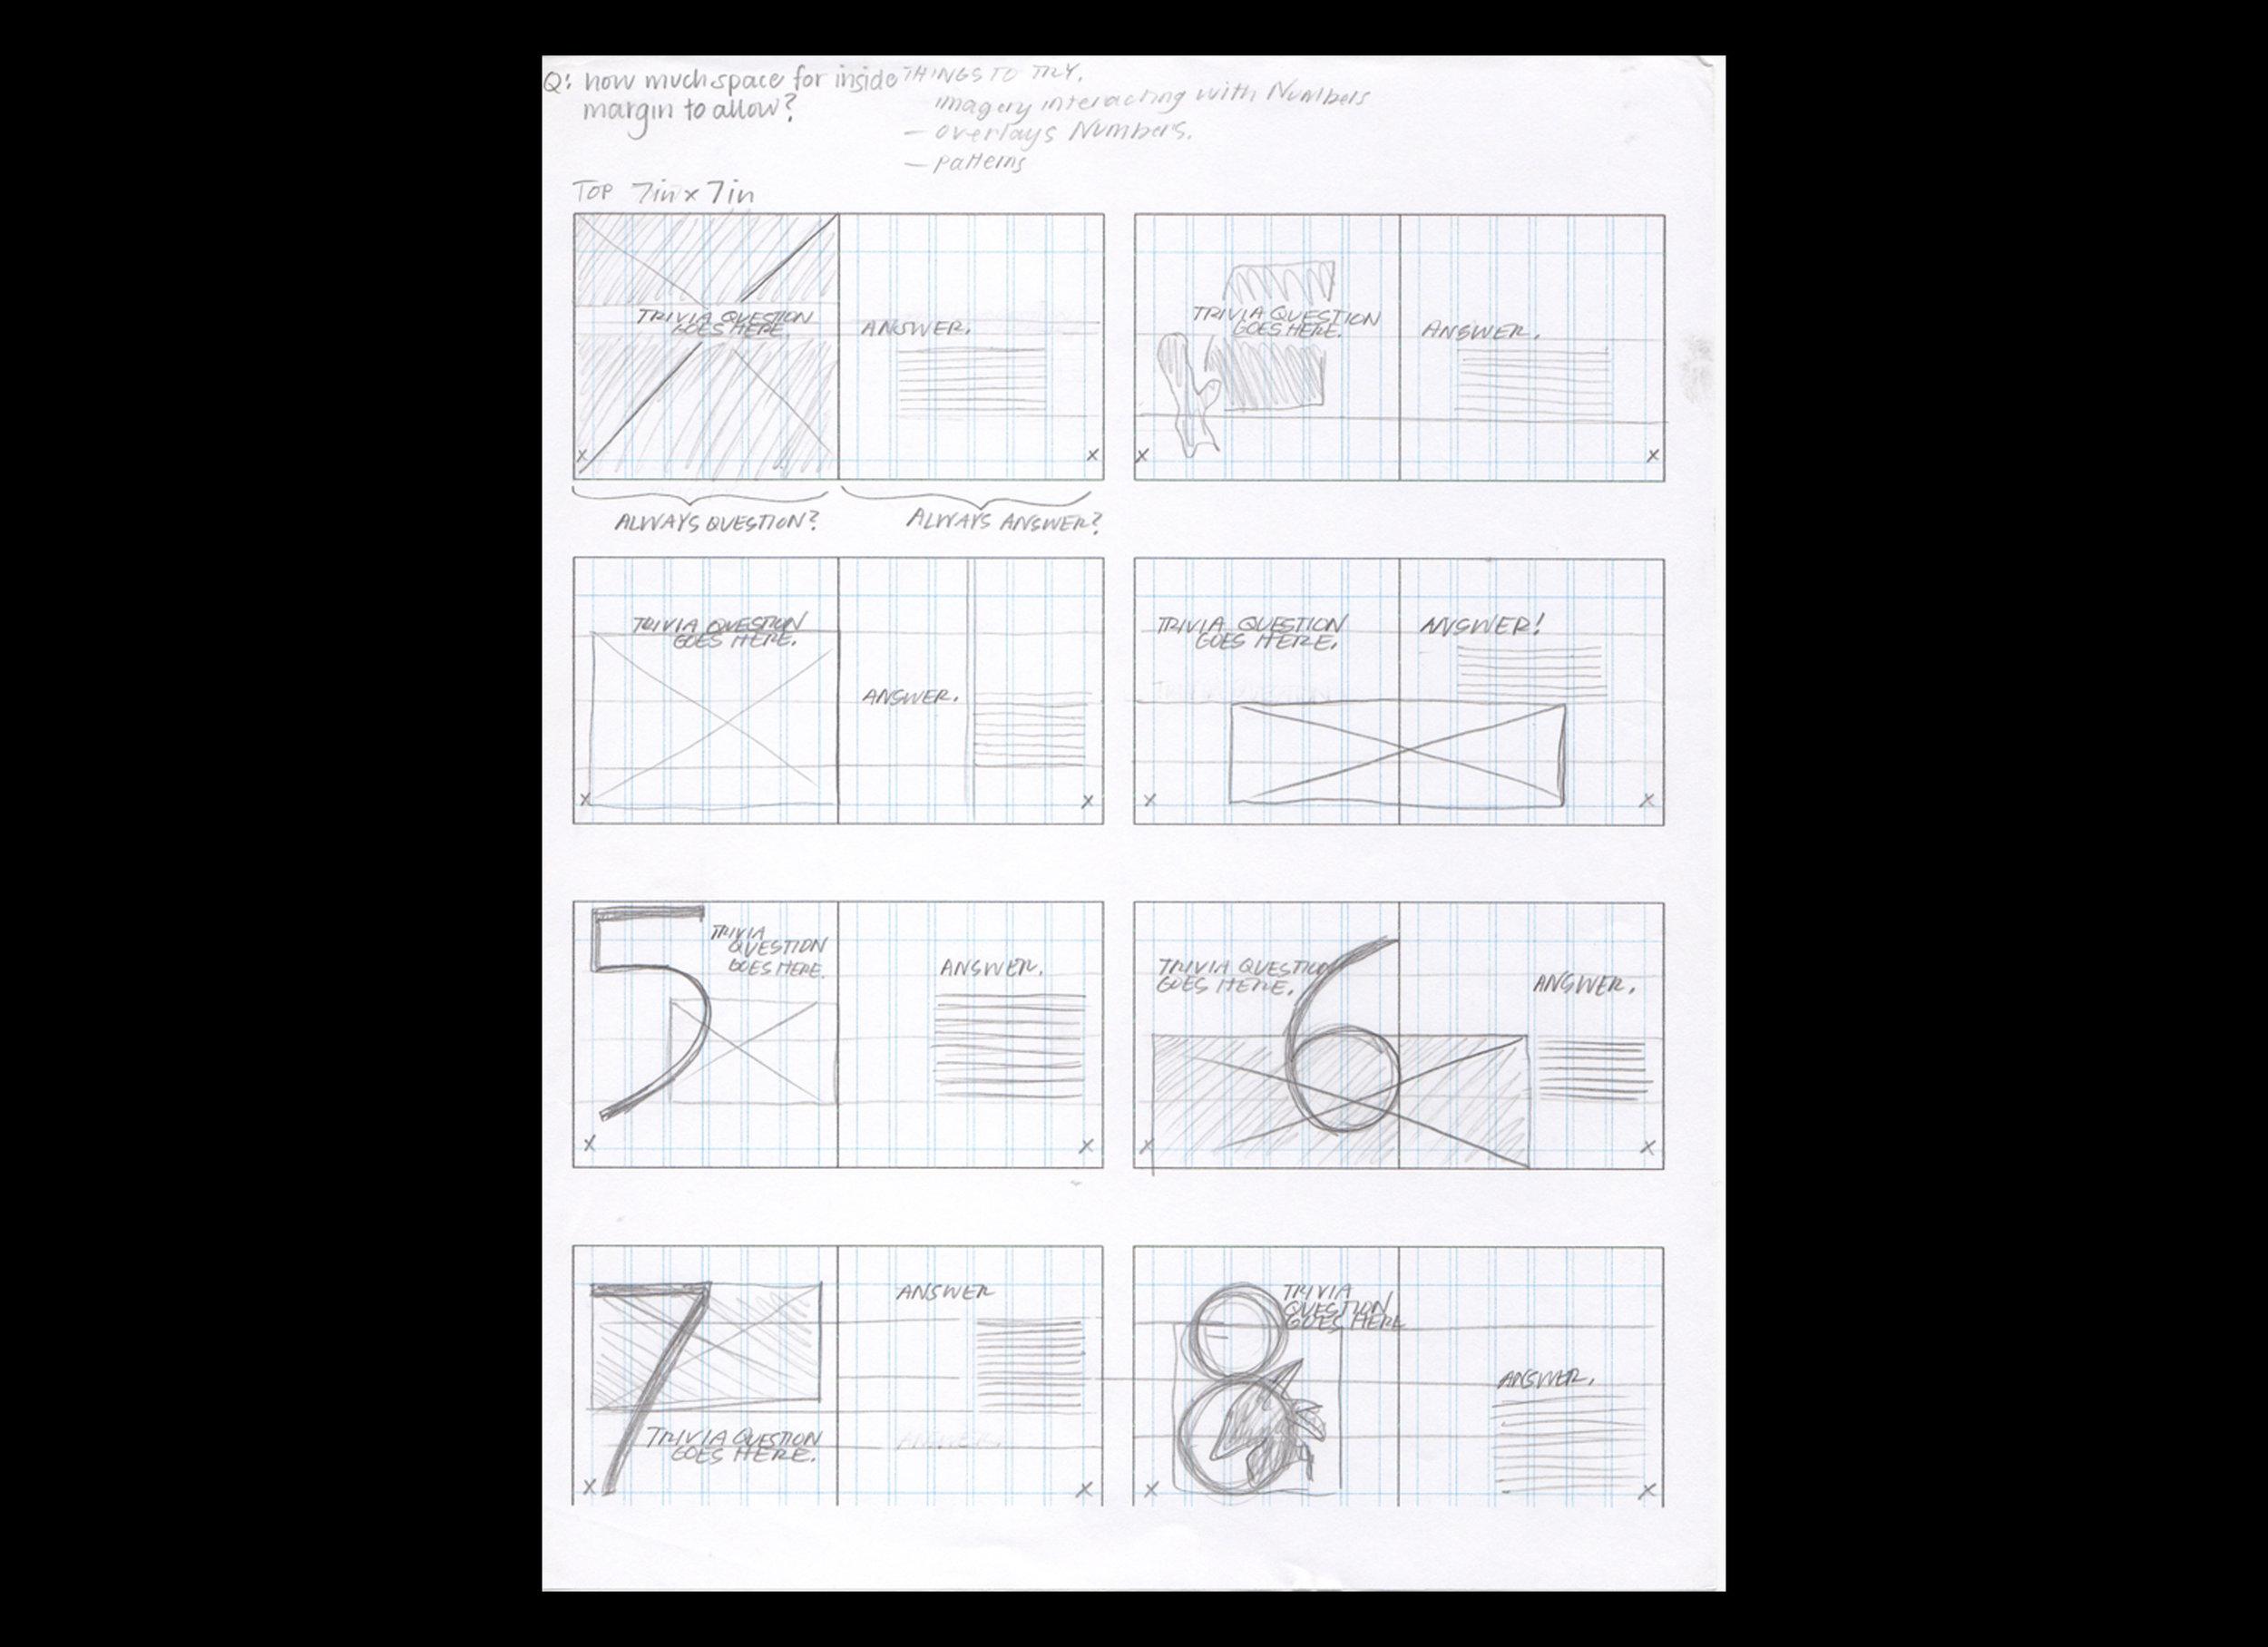 trivia-book-notes-02.jpg